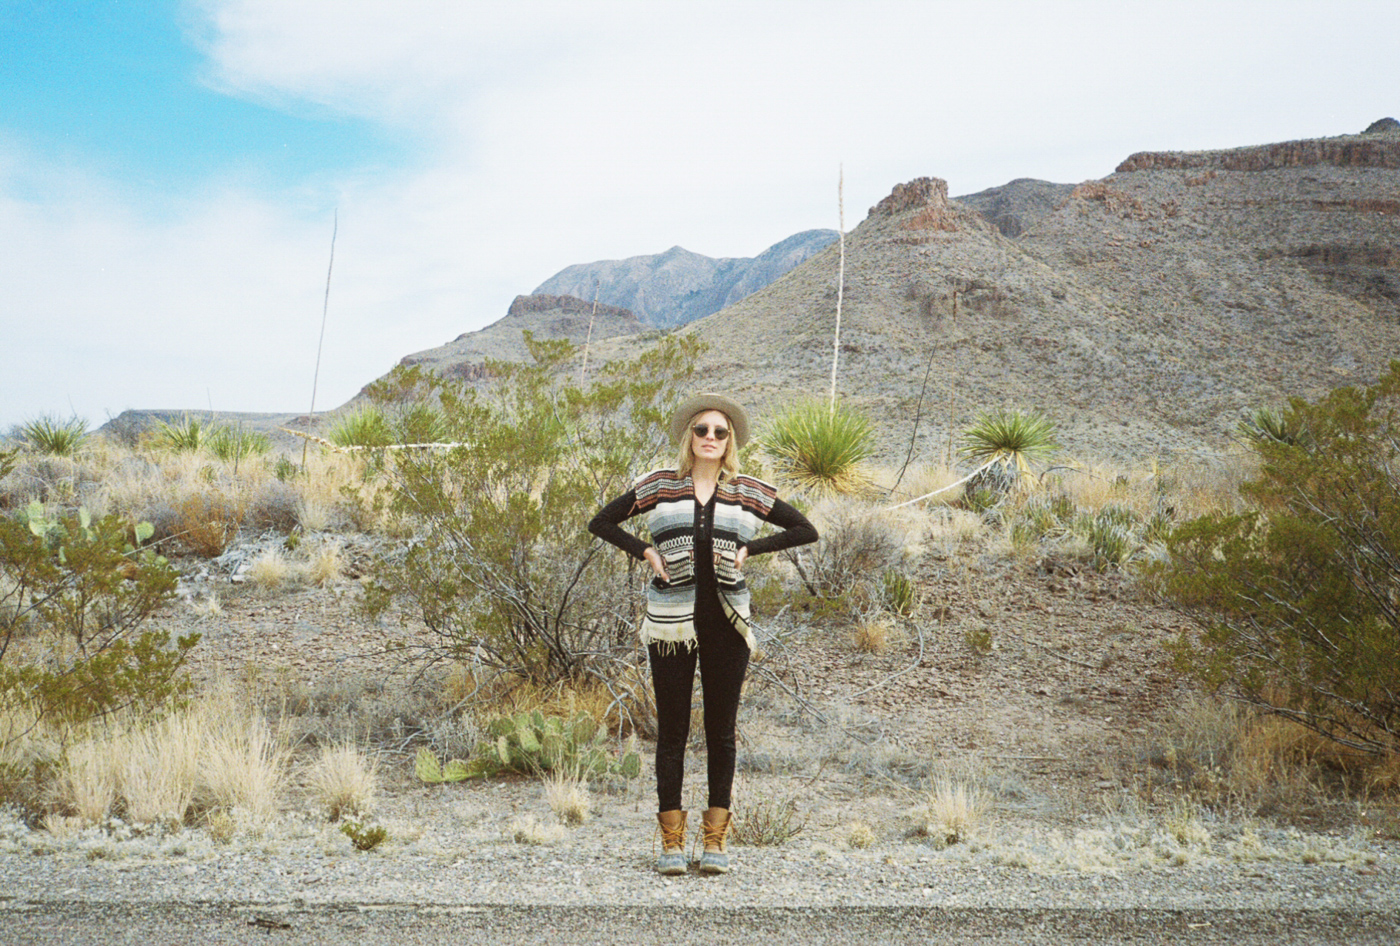 film 35mm lomo olympus hike camp big bend texas america yall pawlowski blanket